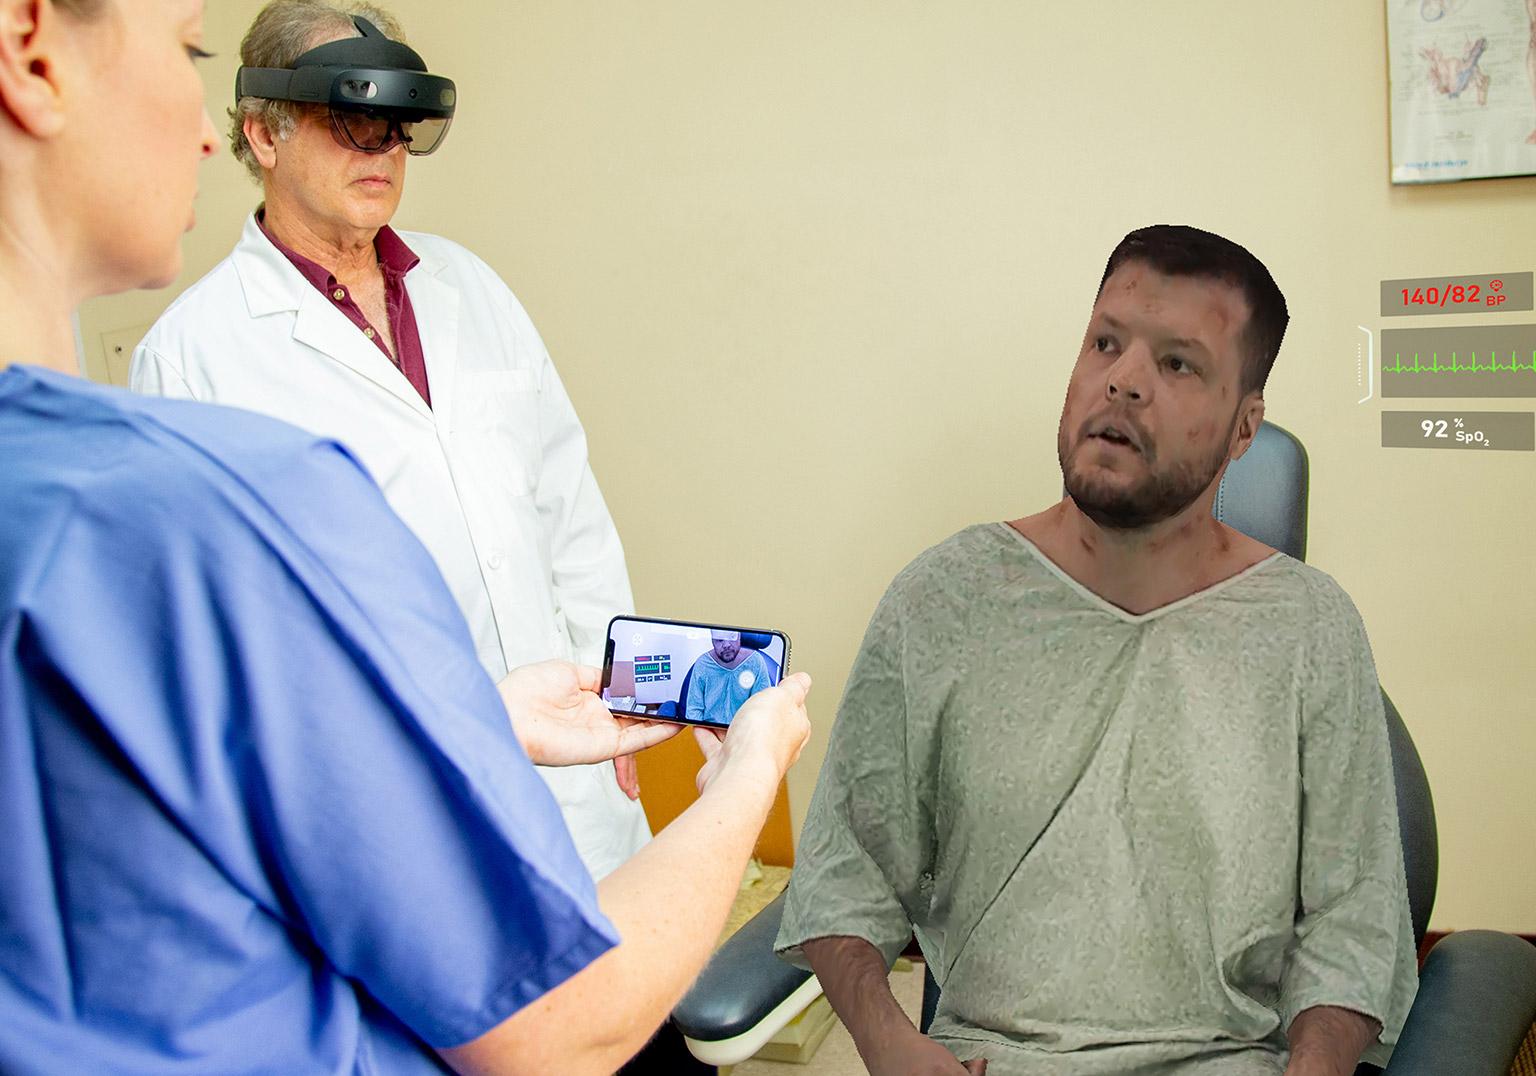 Medical professionals using AR to explore real life scenerios